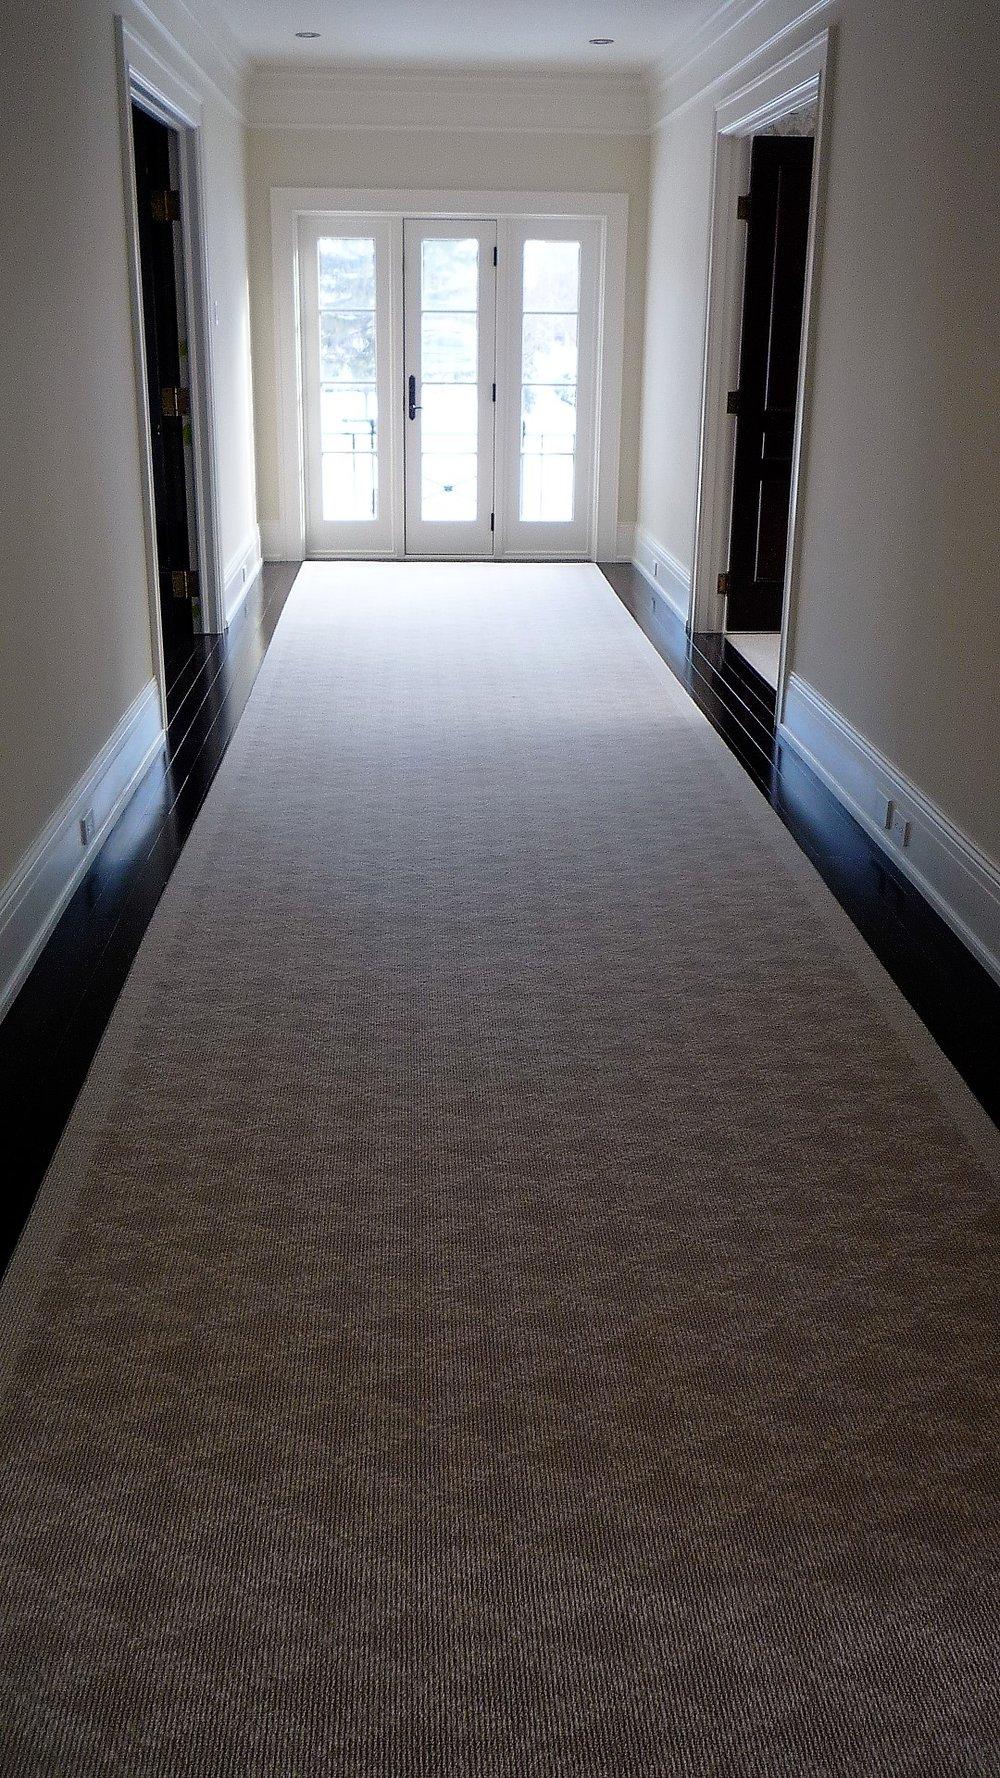 Living area hallway hardwood floors carpet runner.jpg